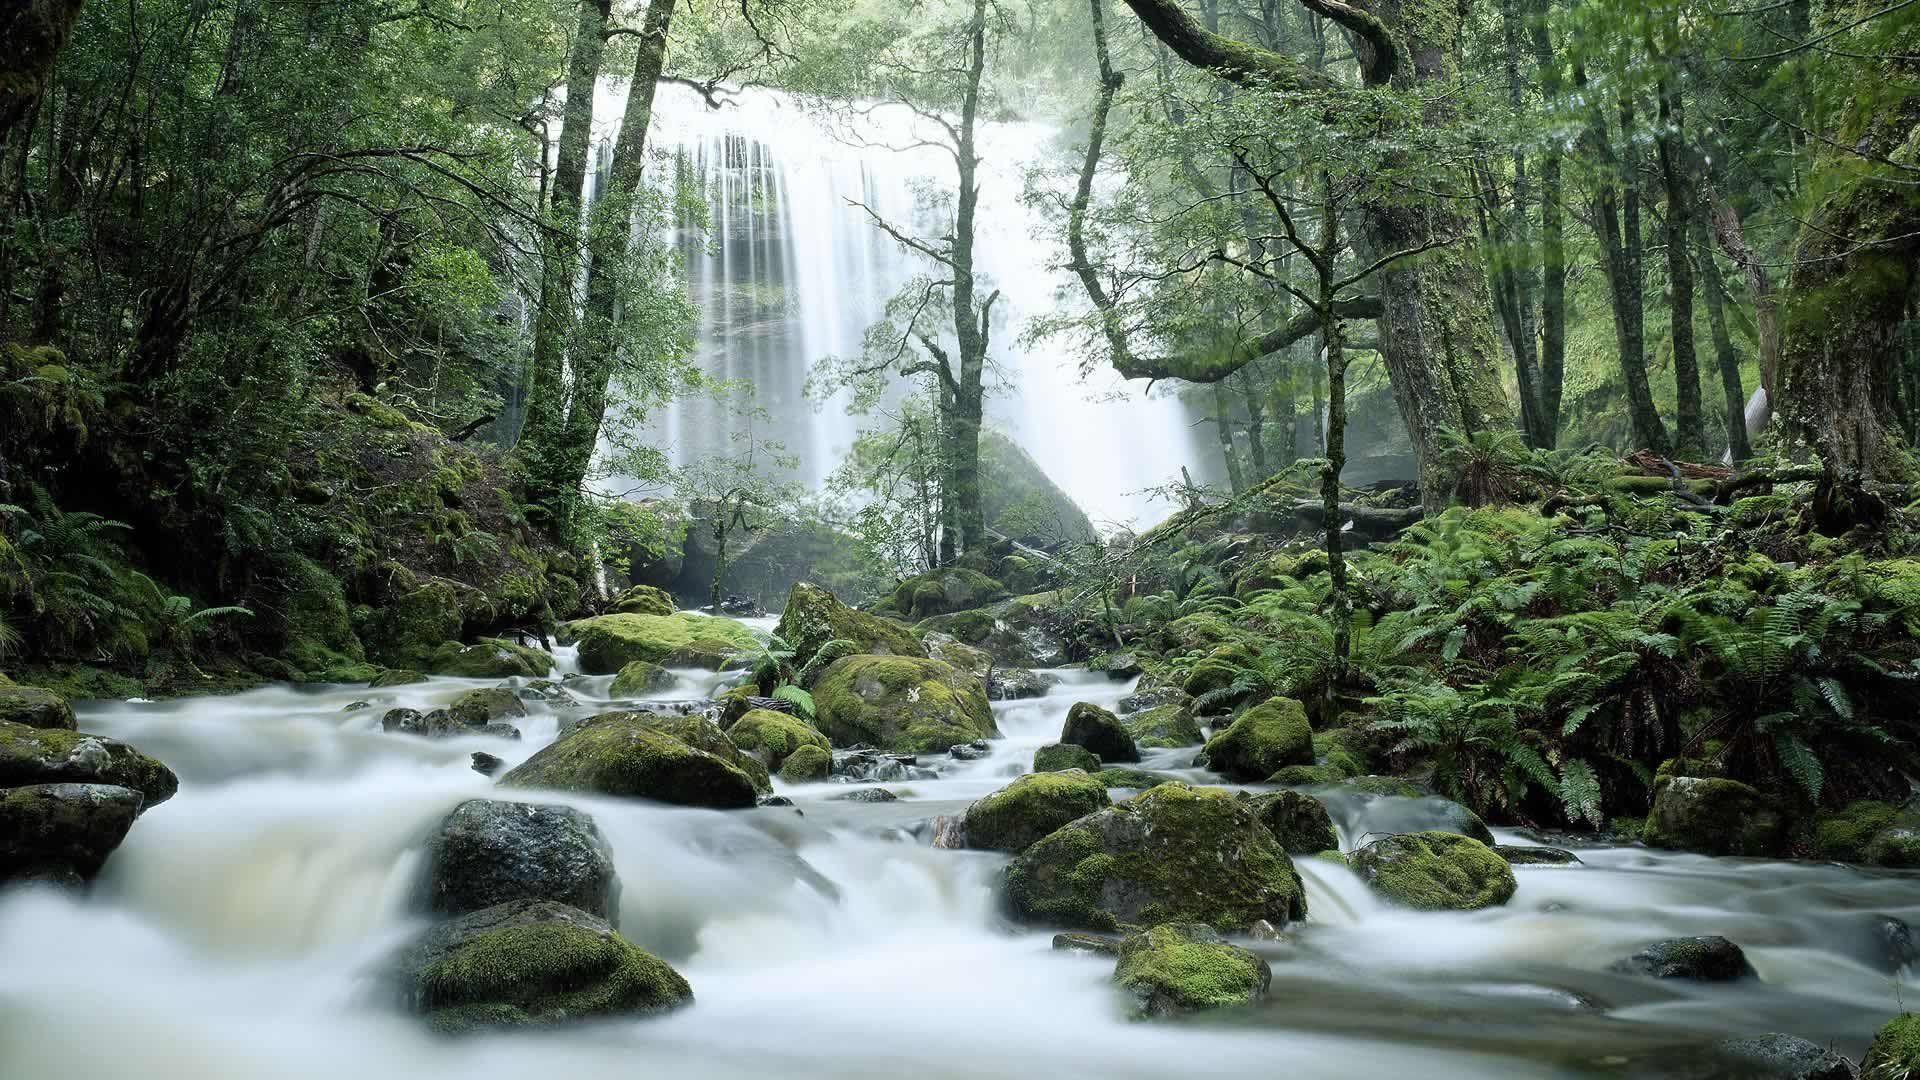 Jerusalem River Waterfalls, Tasmania, Australia ( Ted Meadgetty Images)